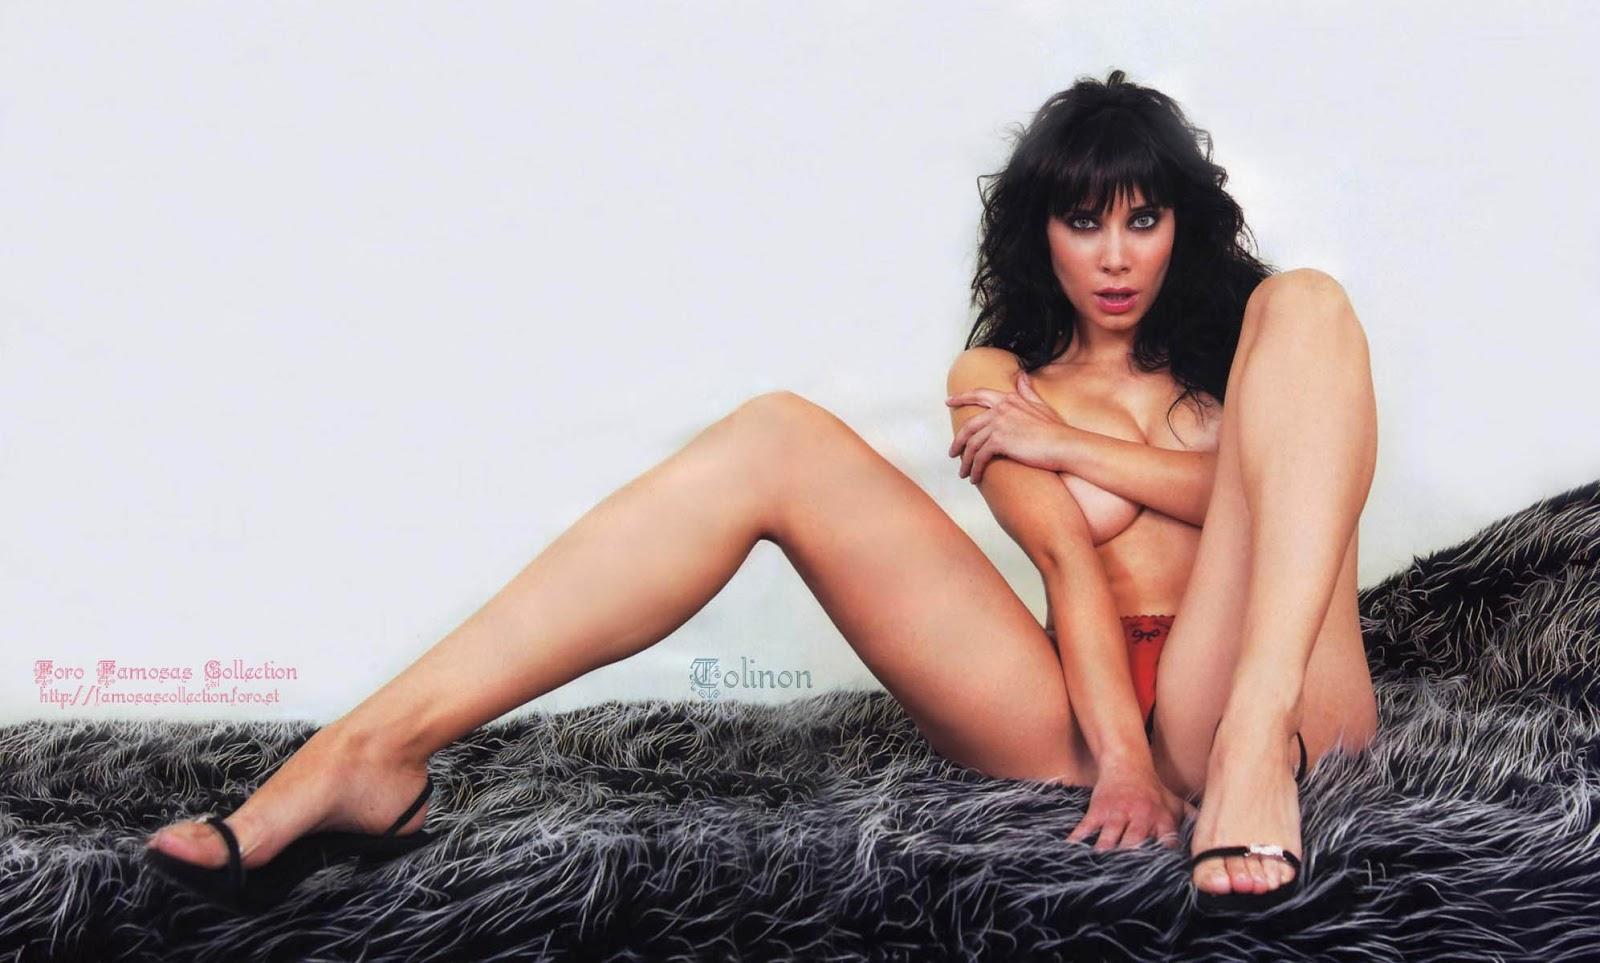 paulina rubio porn fakes